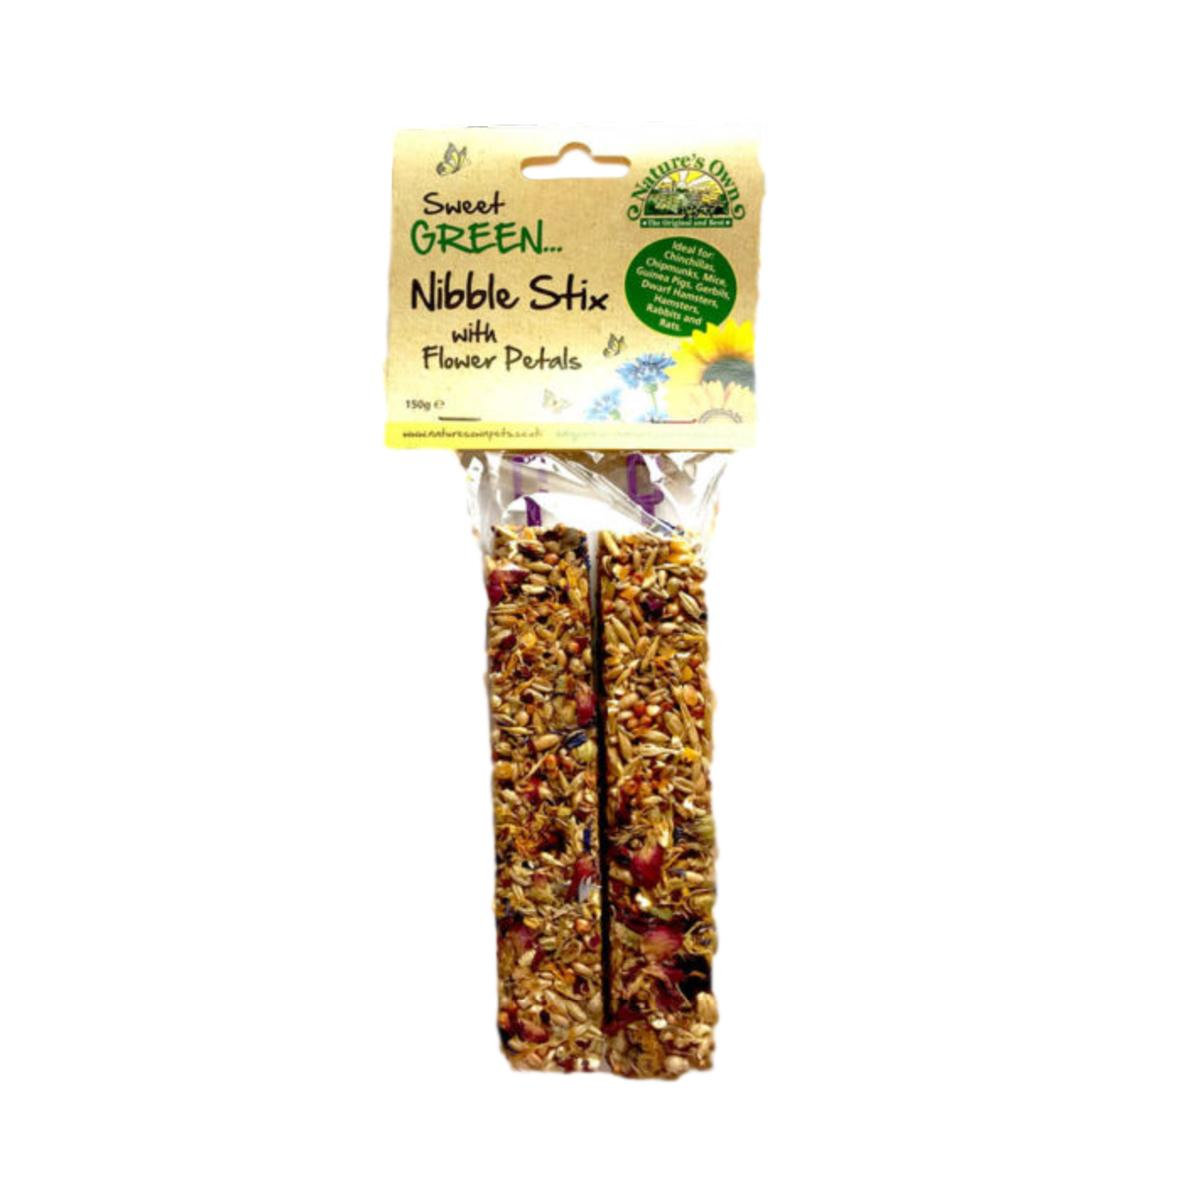 Sweet Green Nibble Stix with Flower Petals 2pcs